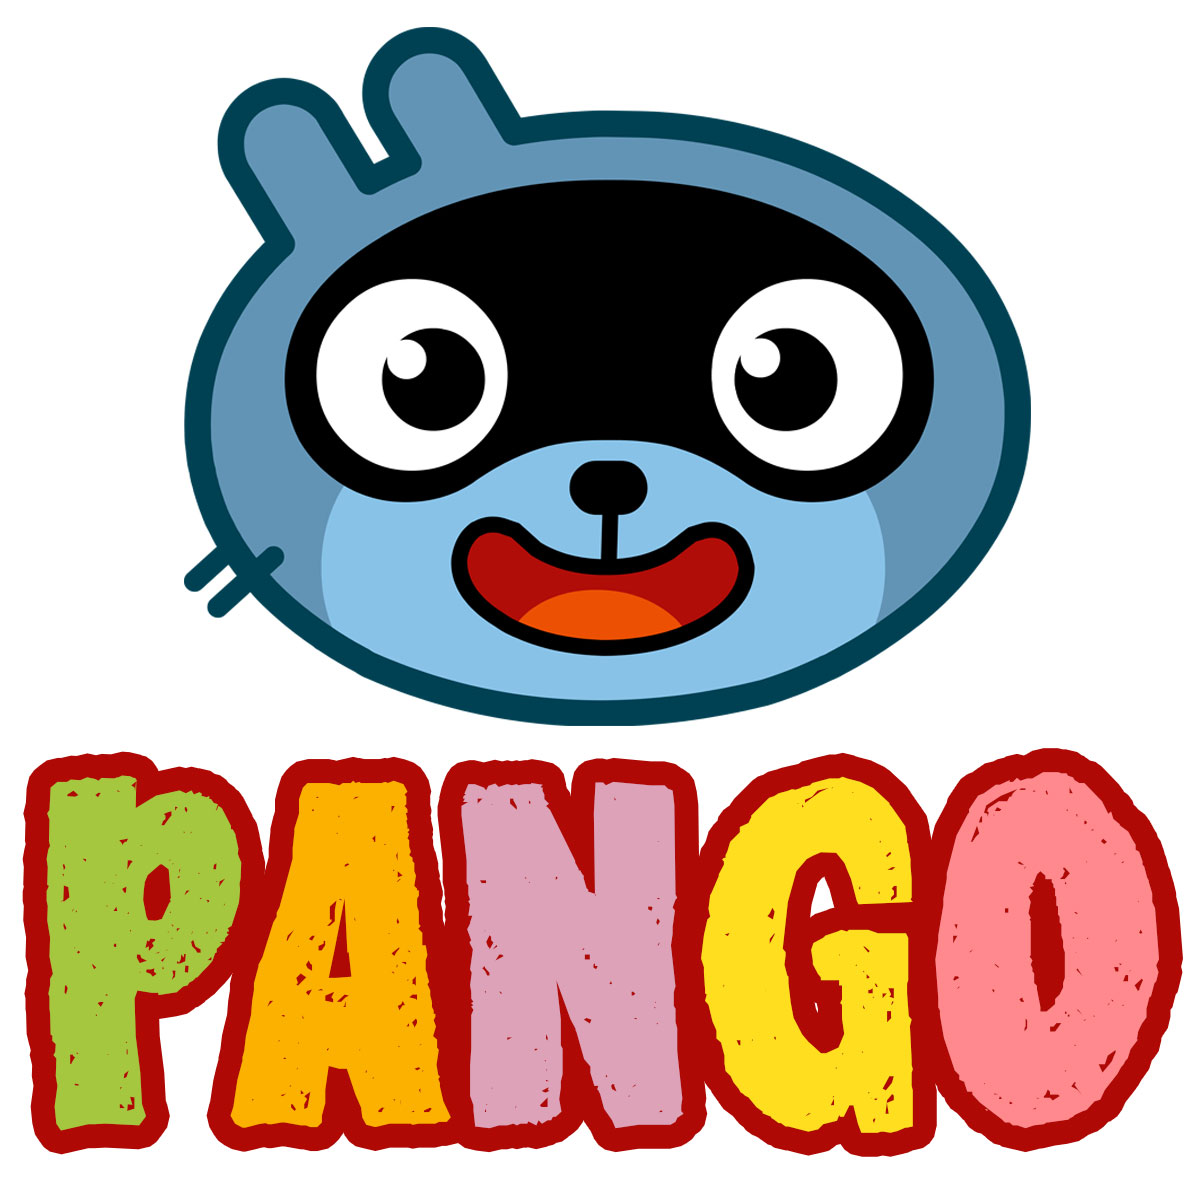 Studio Pango